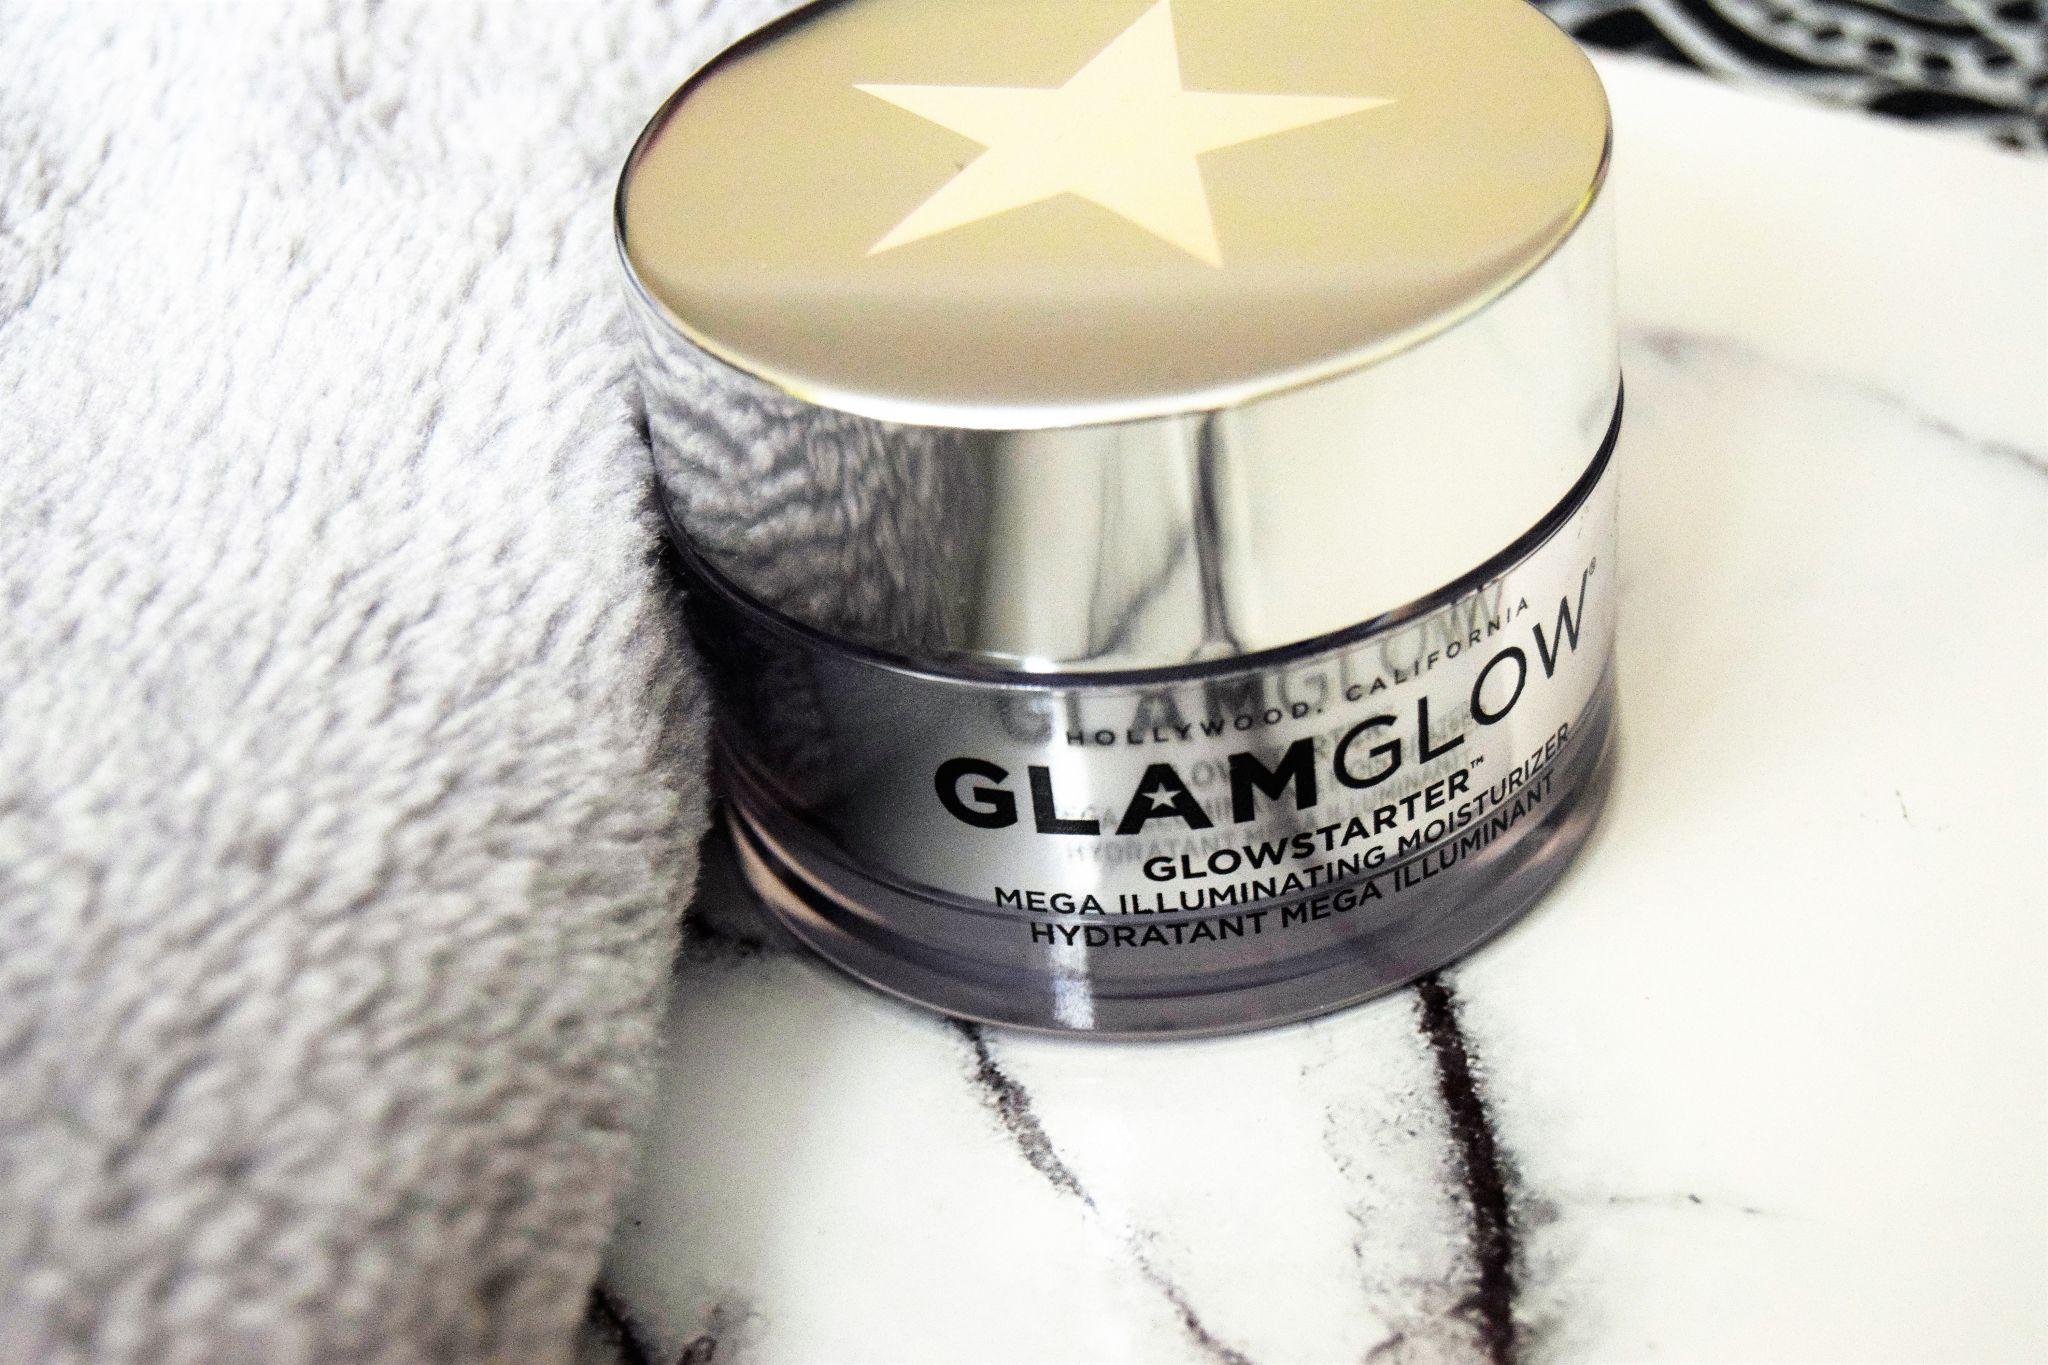 glamglow glamstarter